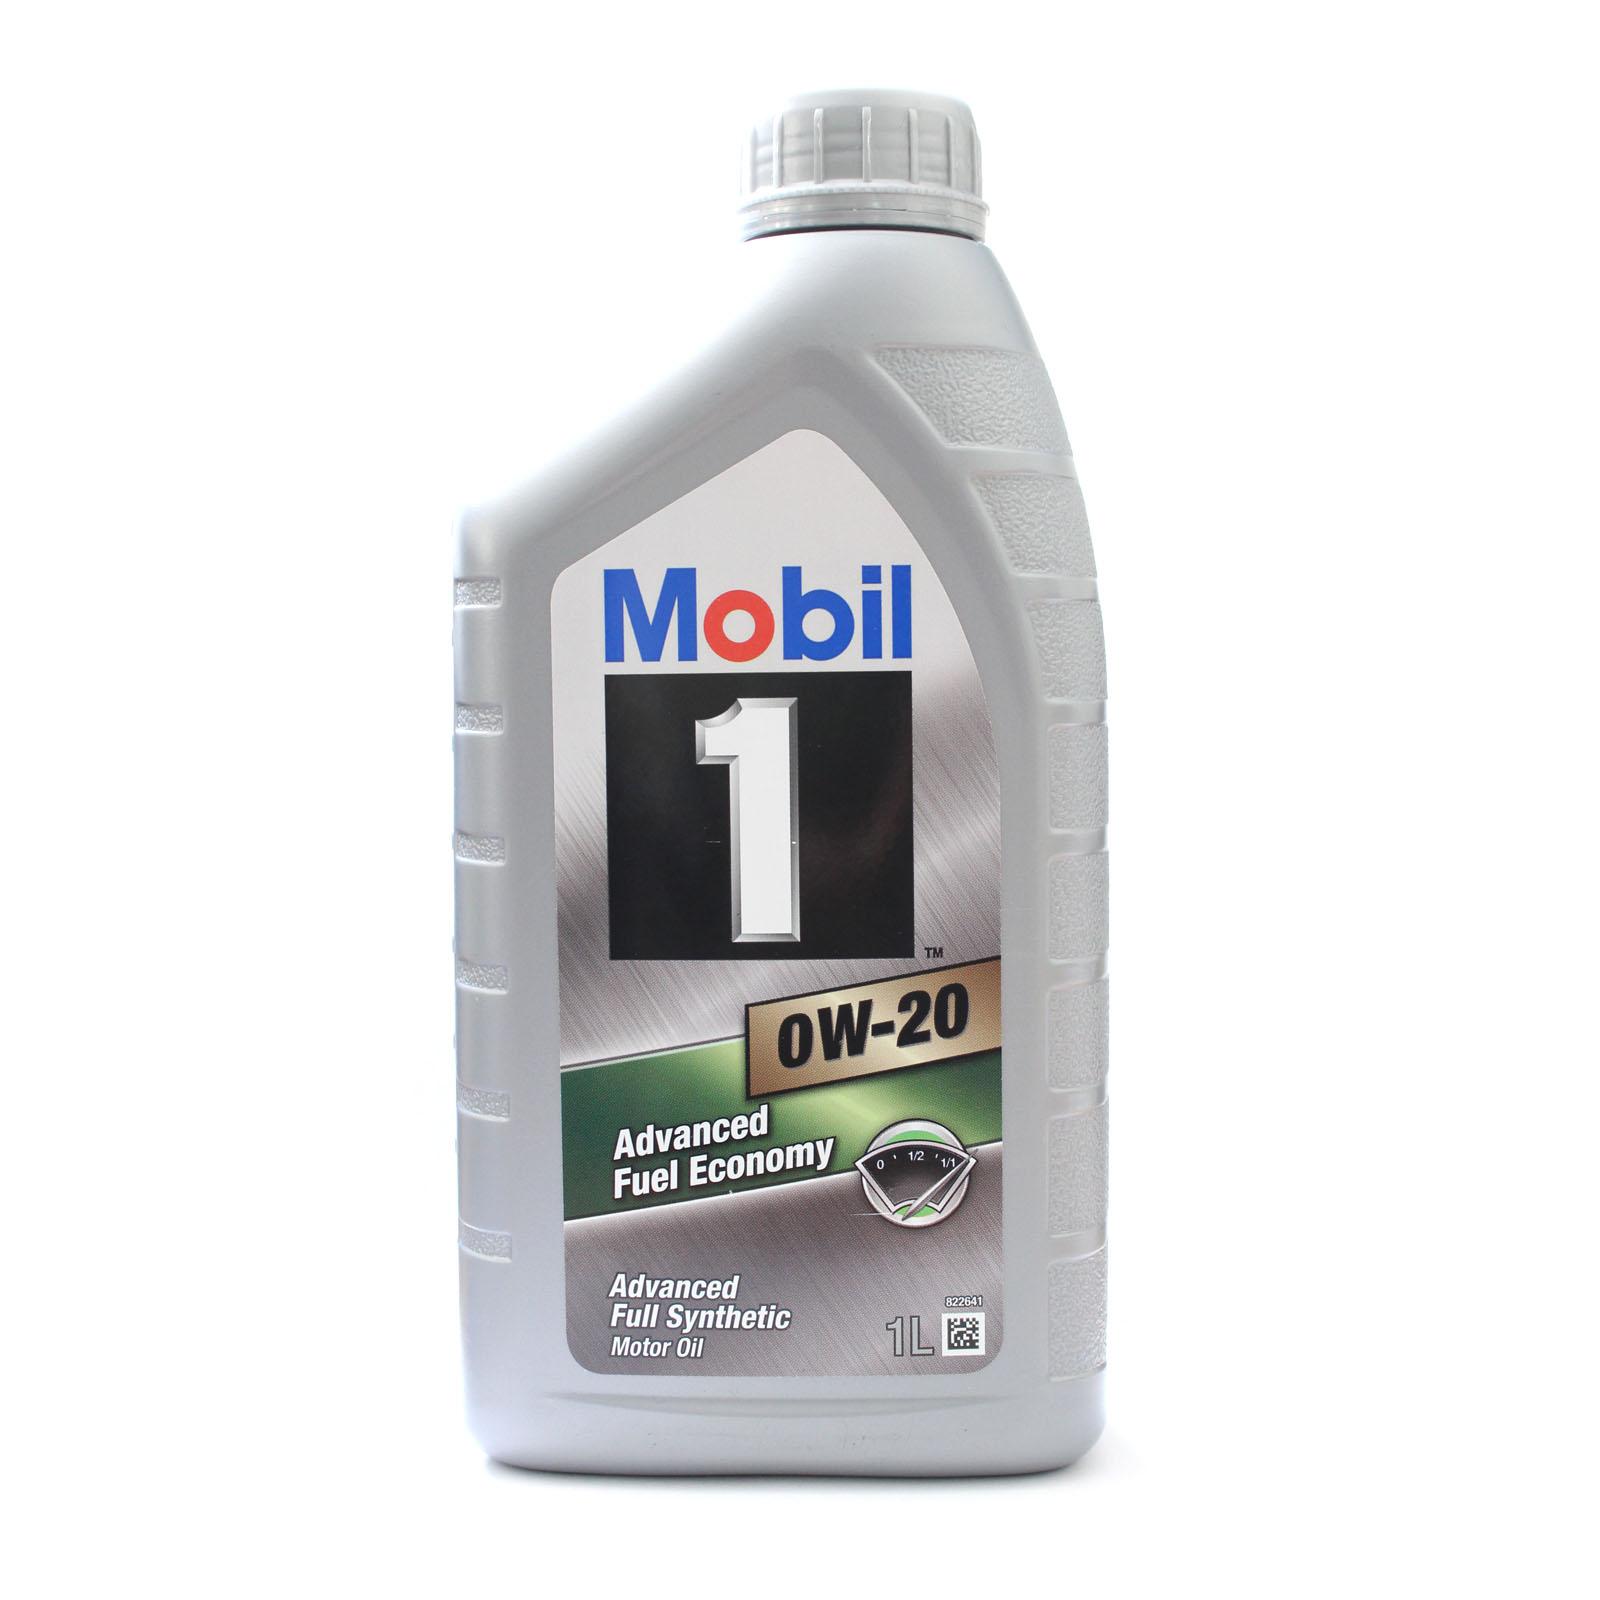 1 Litre Mobil 1 Fuel Economy 0w20 Advanced Performance